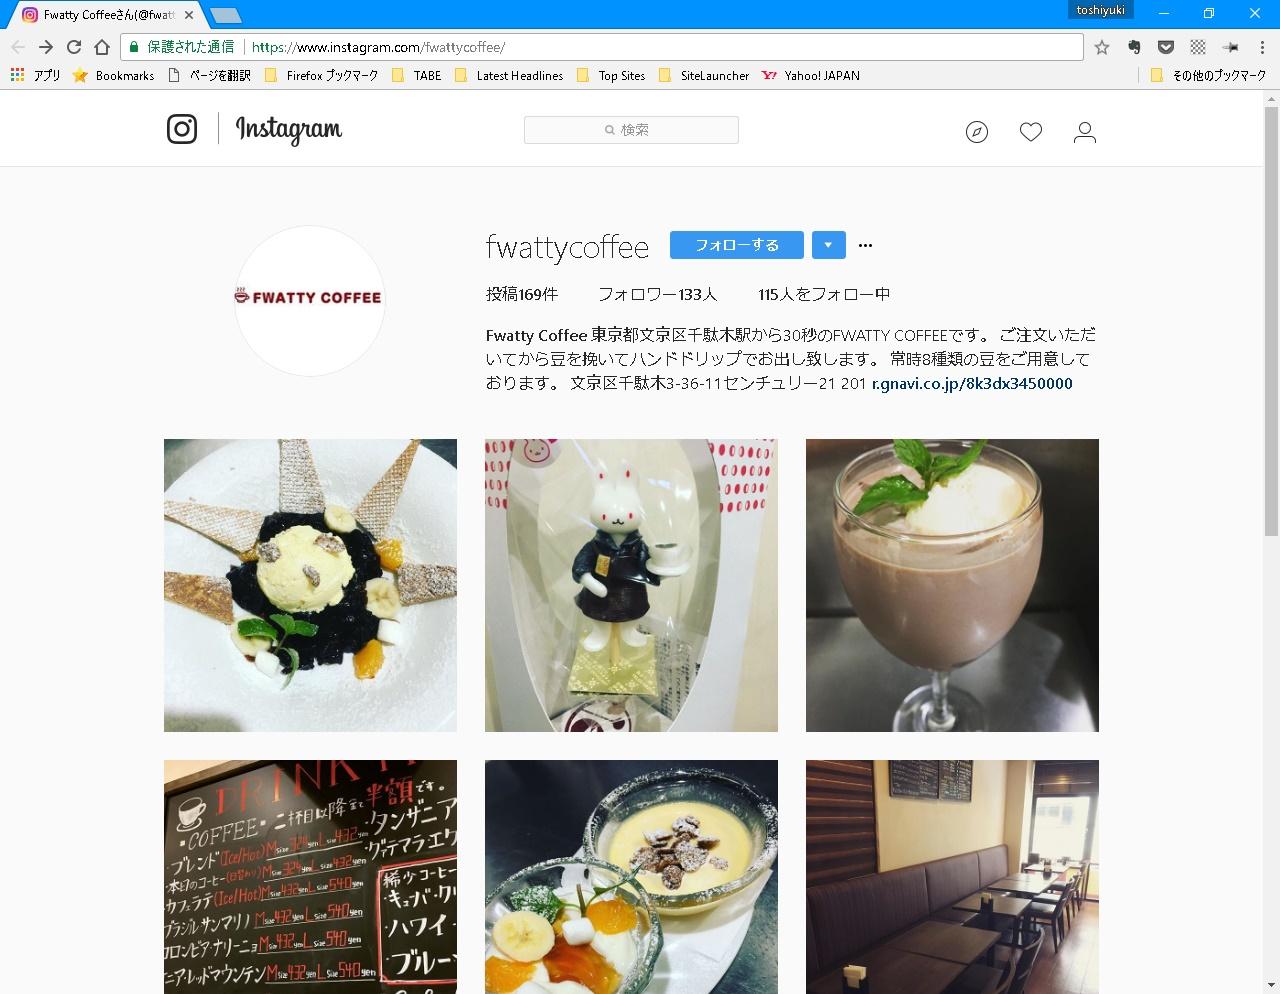 Fwatty Coffee(フワッティコーヒー)